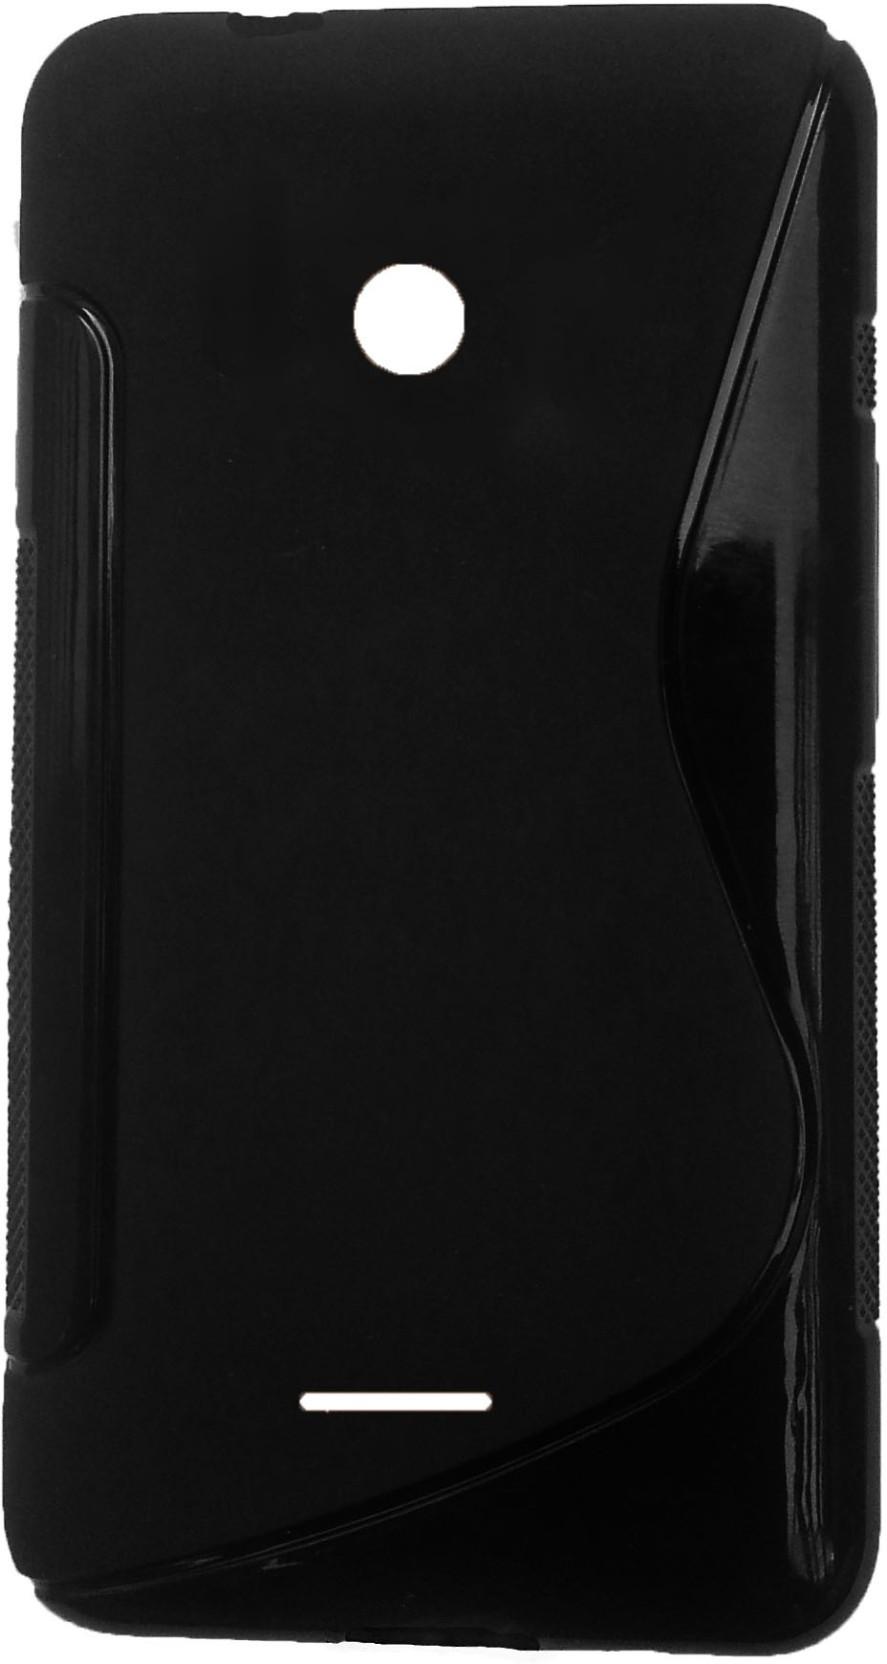 Book Cover Black Flipkart : Accezory back cover for microsoft lumia